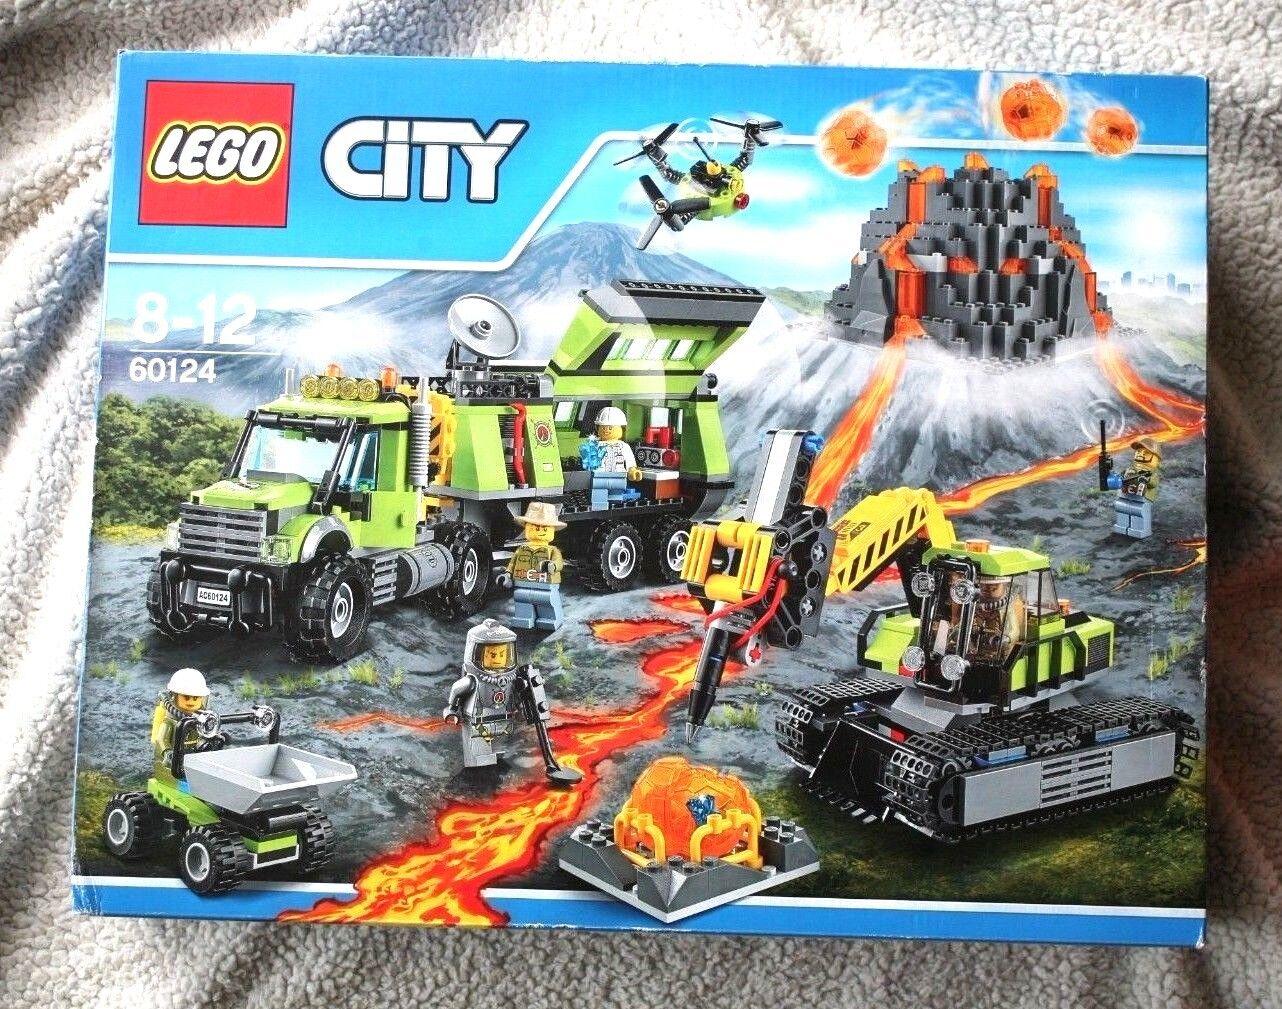 LEGO CITY: VOLCANO EXPLORATION BASE (60124). BRAND NEW IN BOX